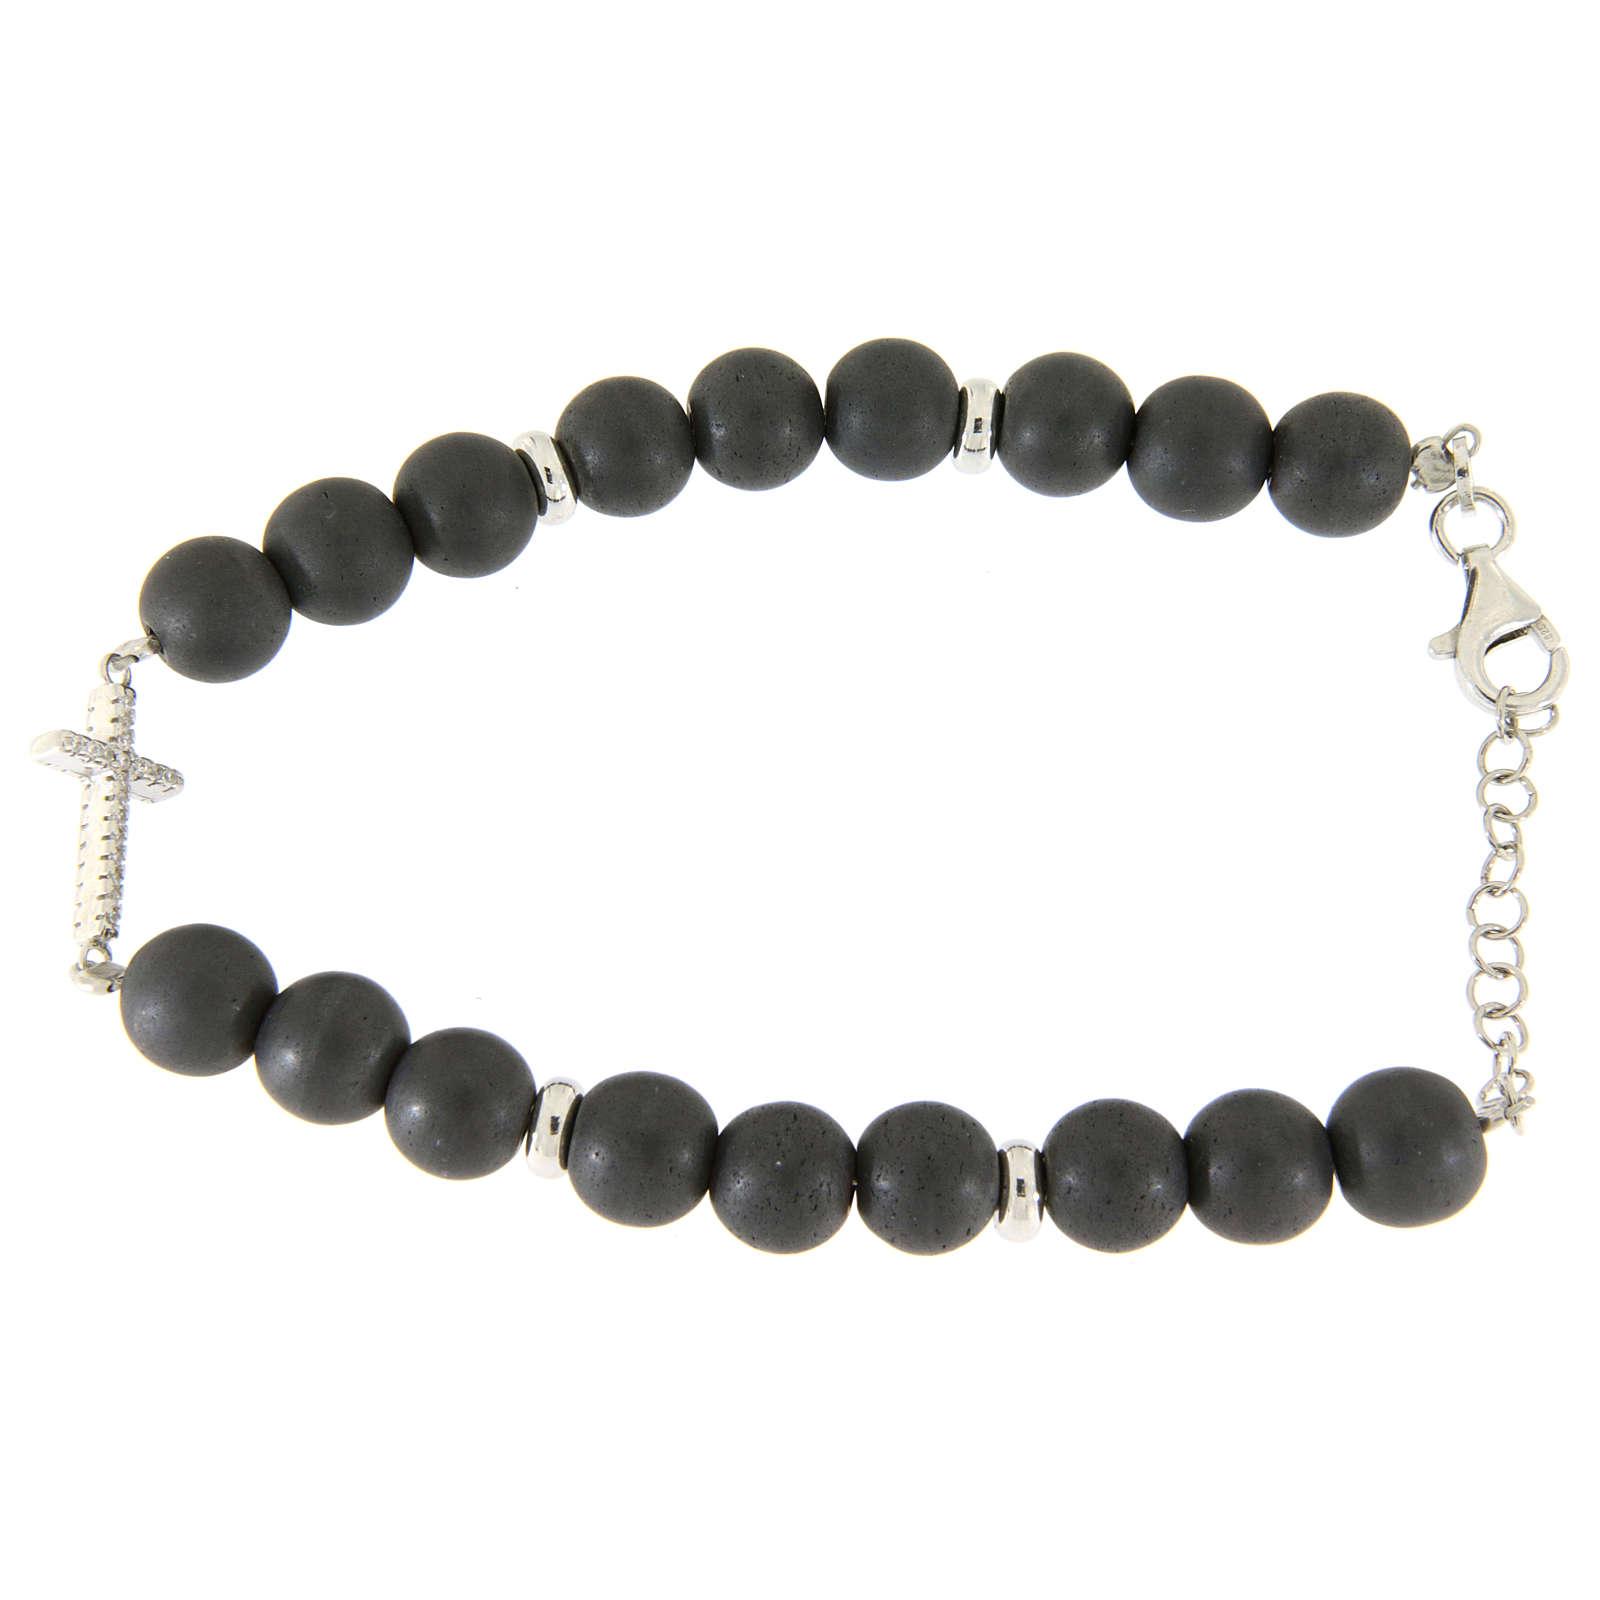 Bracciale perline ematite grigie 7 mm, croce zirconi bianchi 4